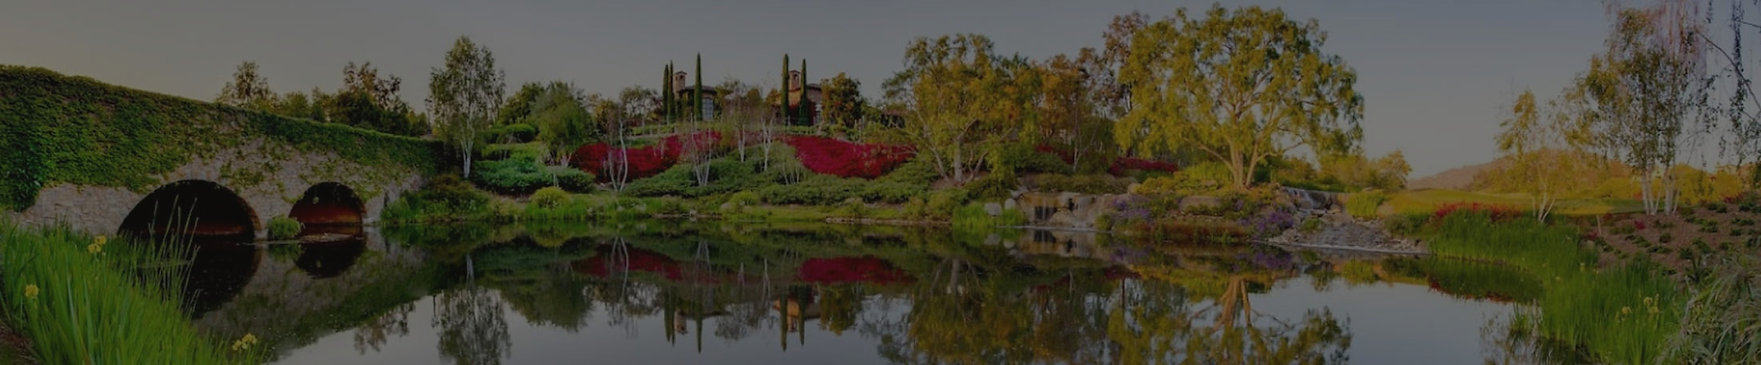 Rancho-Santa-Fe_East_001_edited.jpg